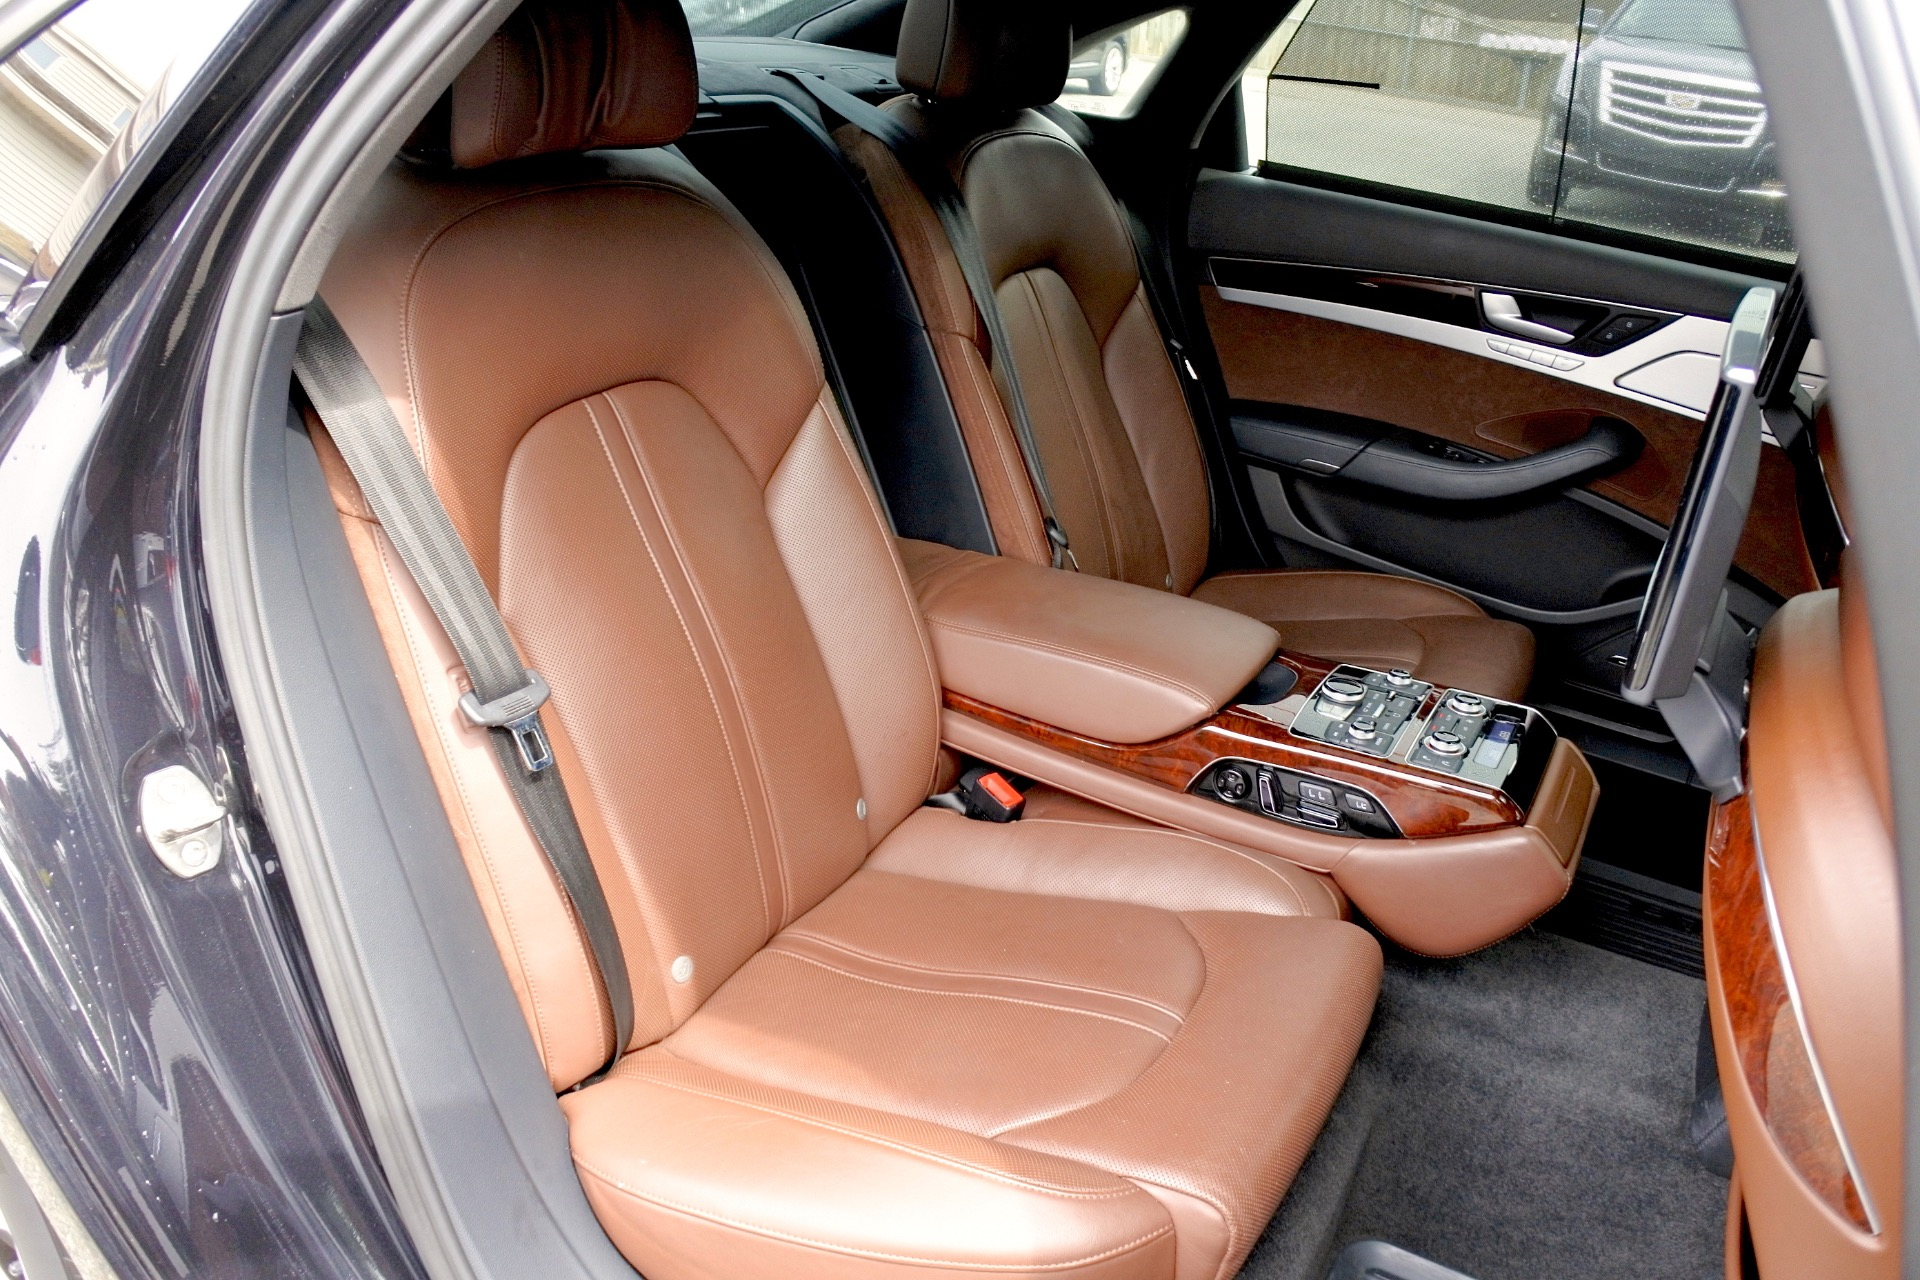 Used 2012 Audi A8 l W12 Quattro Used 2012 Audi A8 l W12 Quattro for sale  at Metro West Motorcars LLC in Shrewsbury MA 18